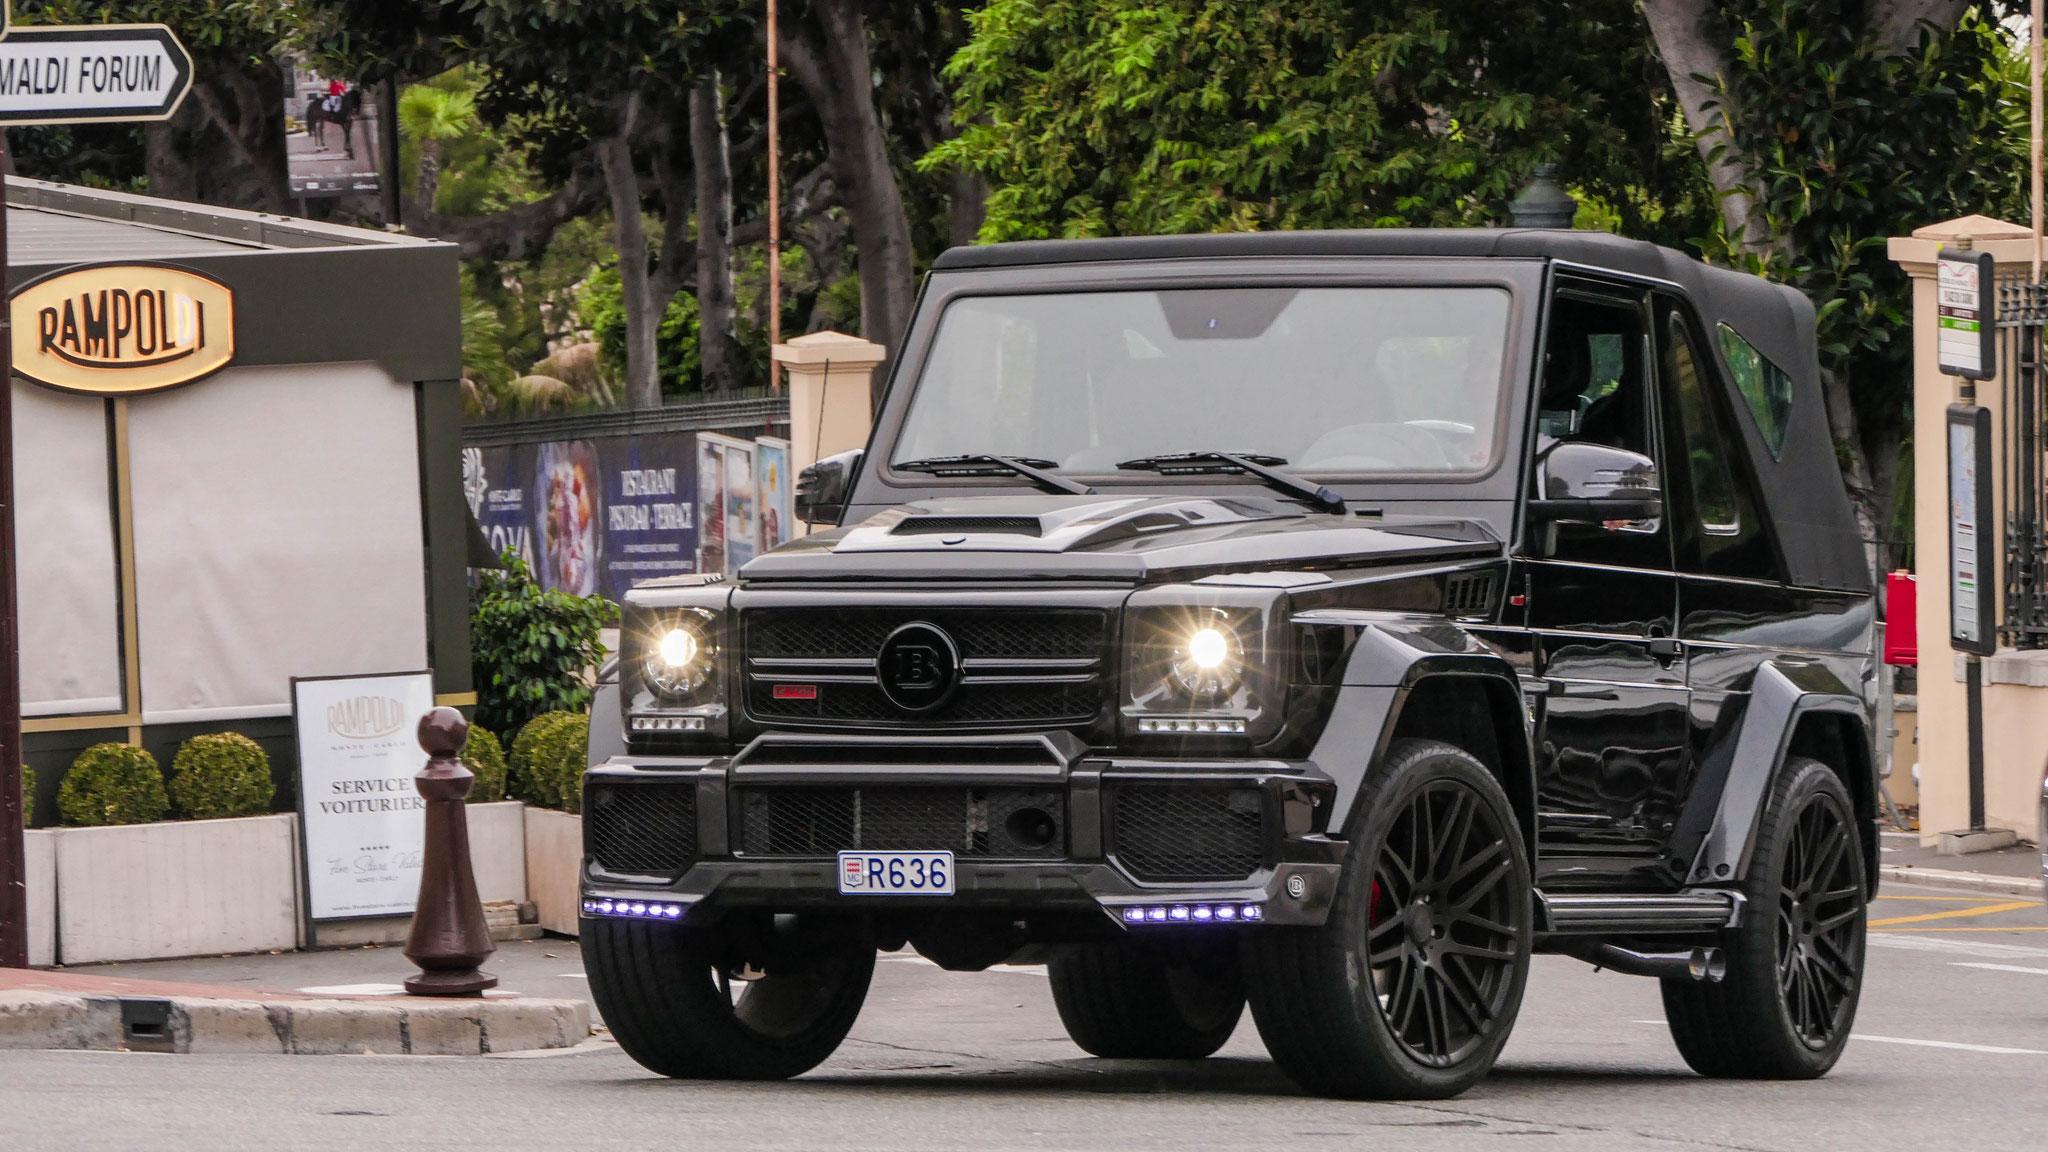 Brabus G Cabriolet - R636 (MC)